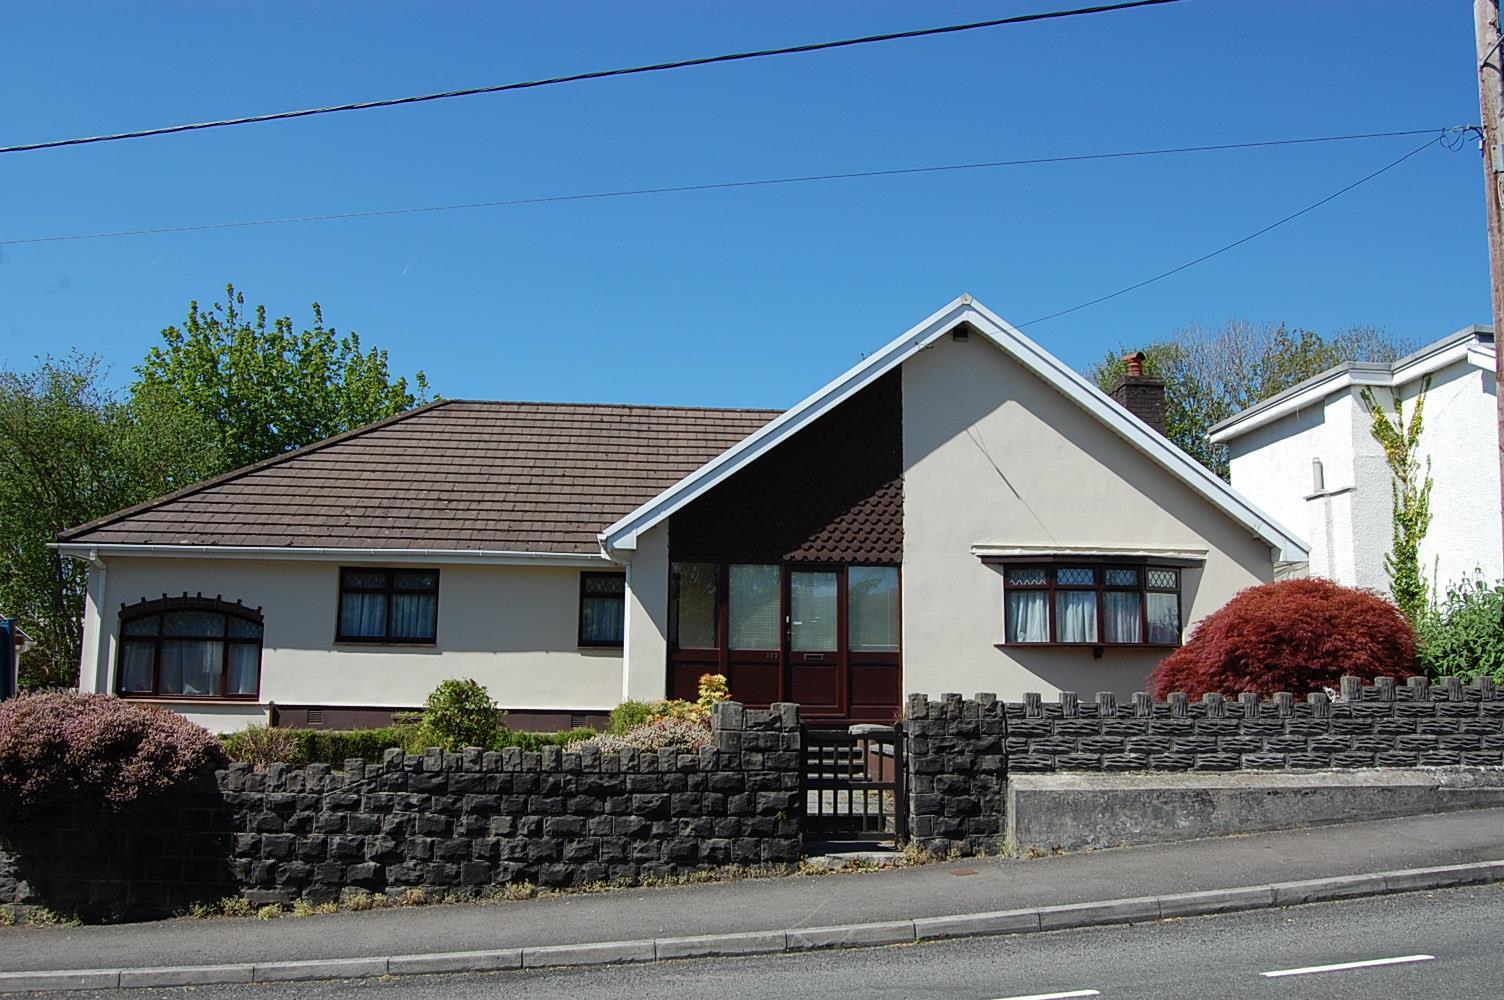 102 High Street, Ammanford, Carmarthenshire